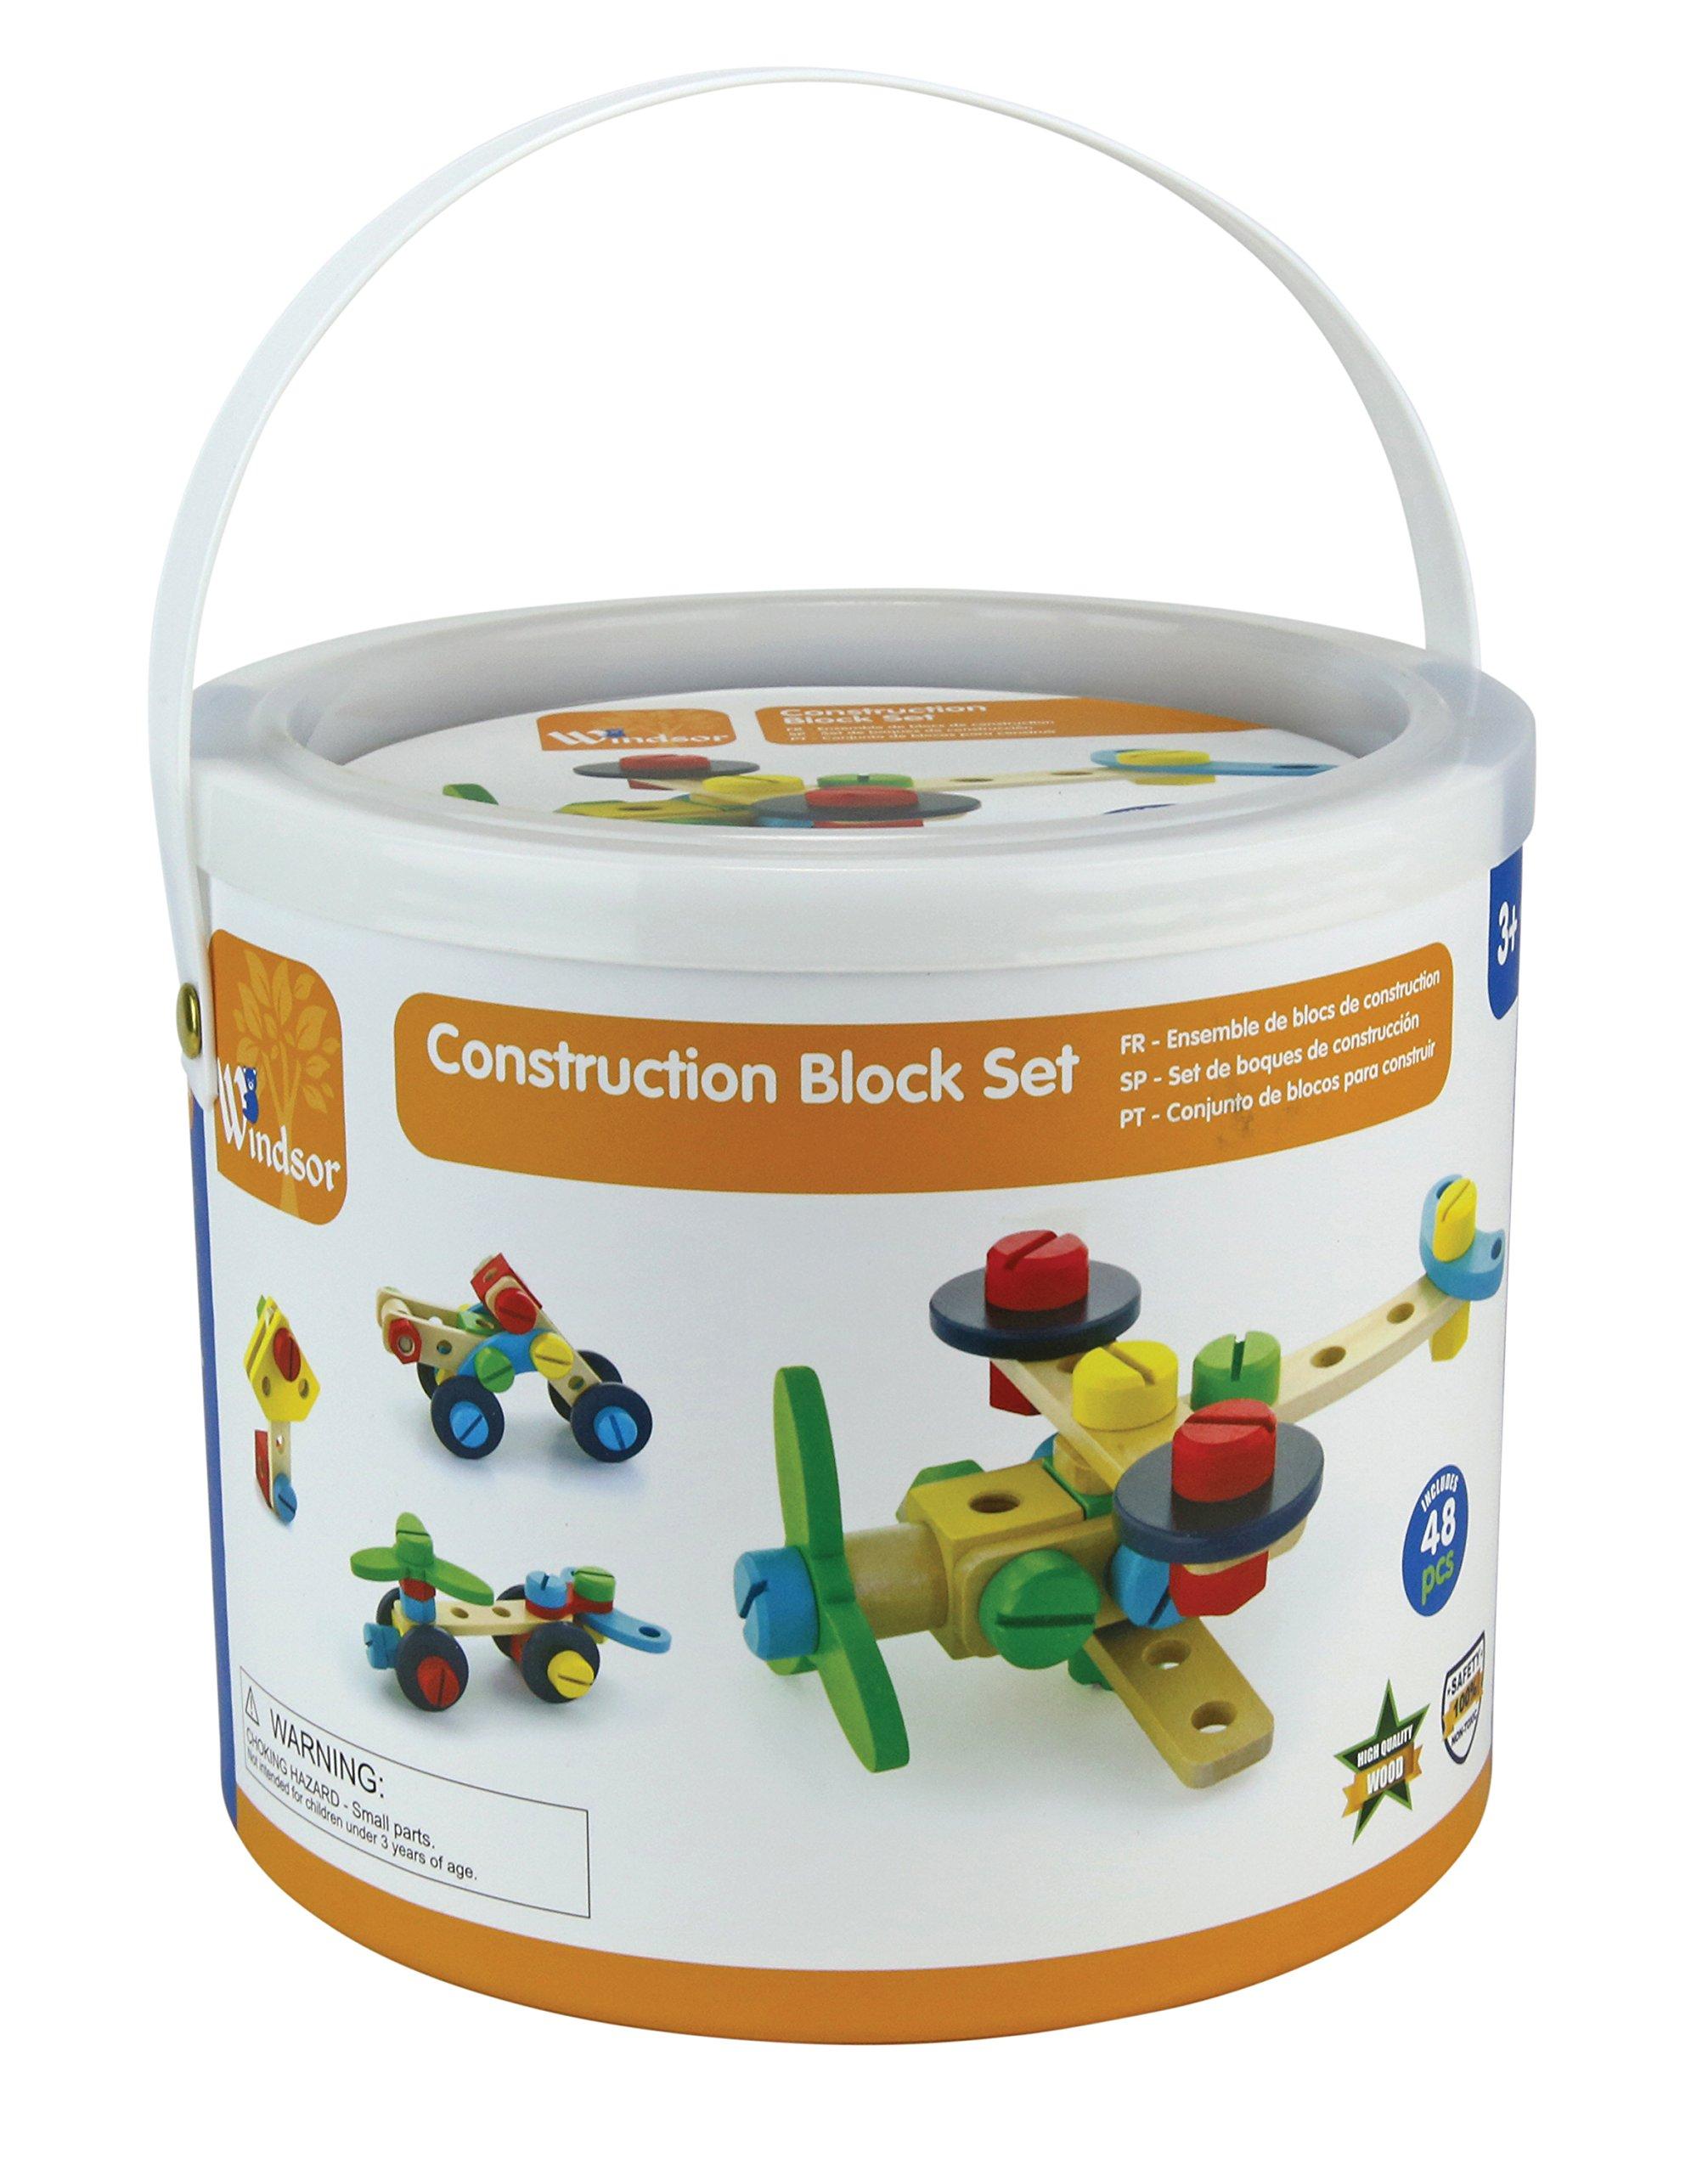 Windsor 48 Pieces Construction Block Set